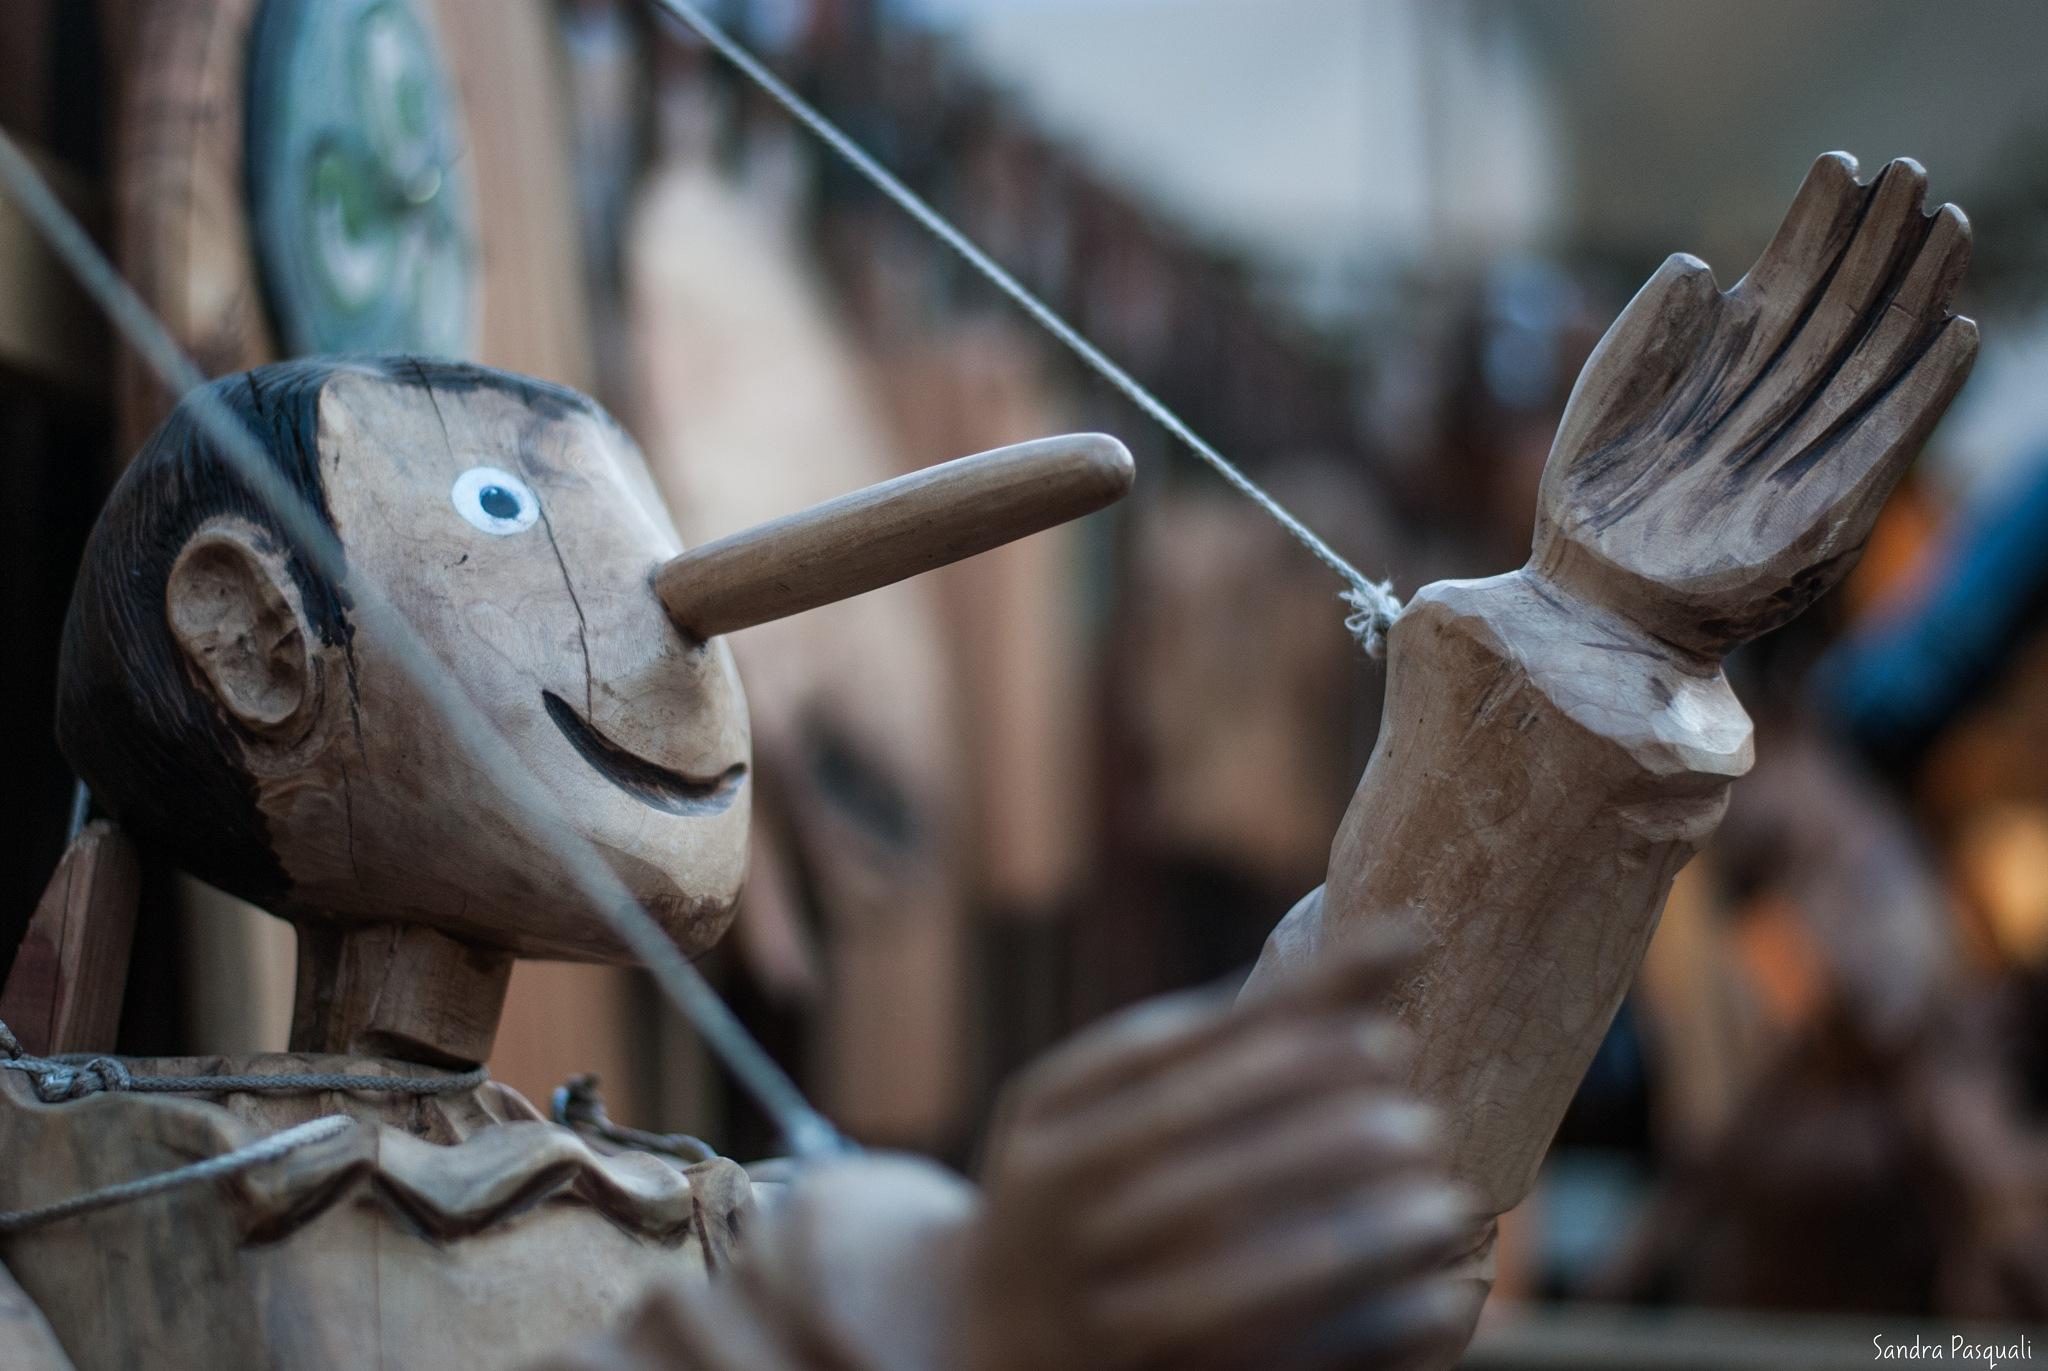 Pinocchio by La Sandra